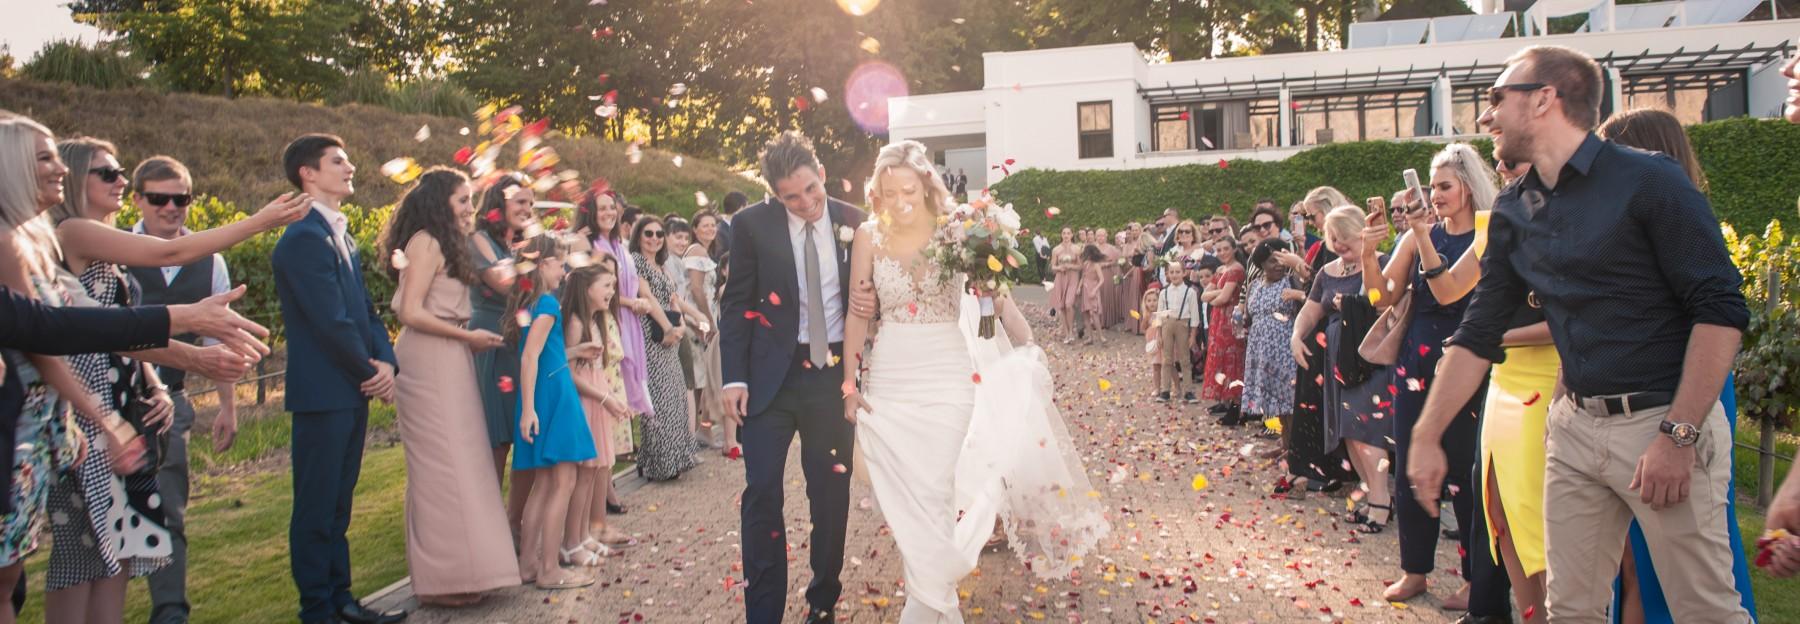 a-wedding-budget-overview